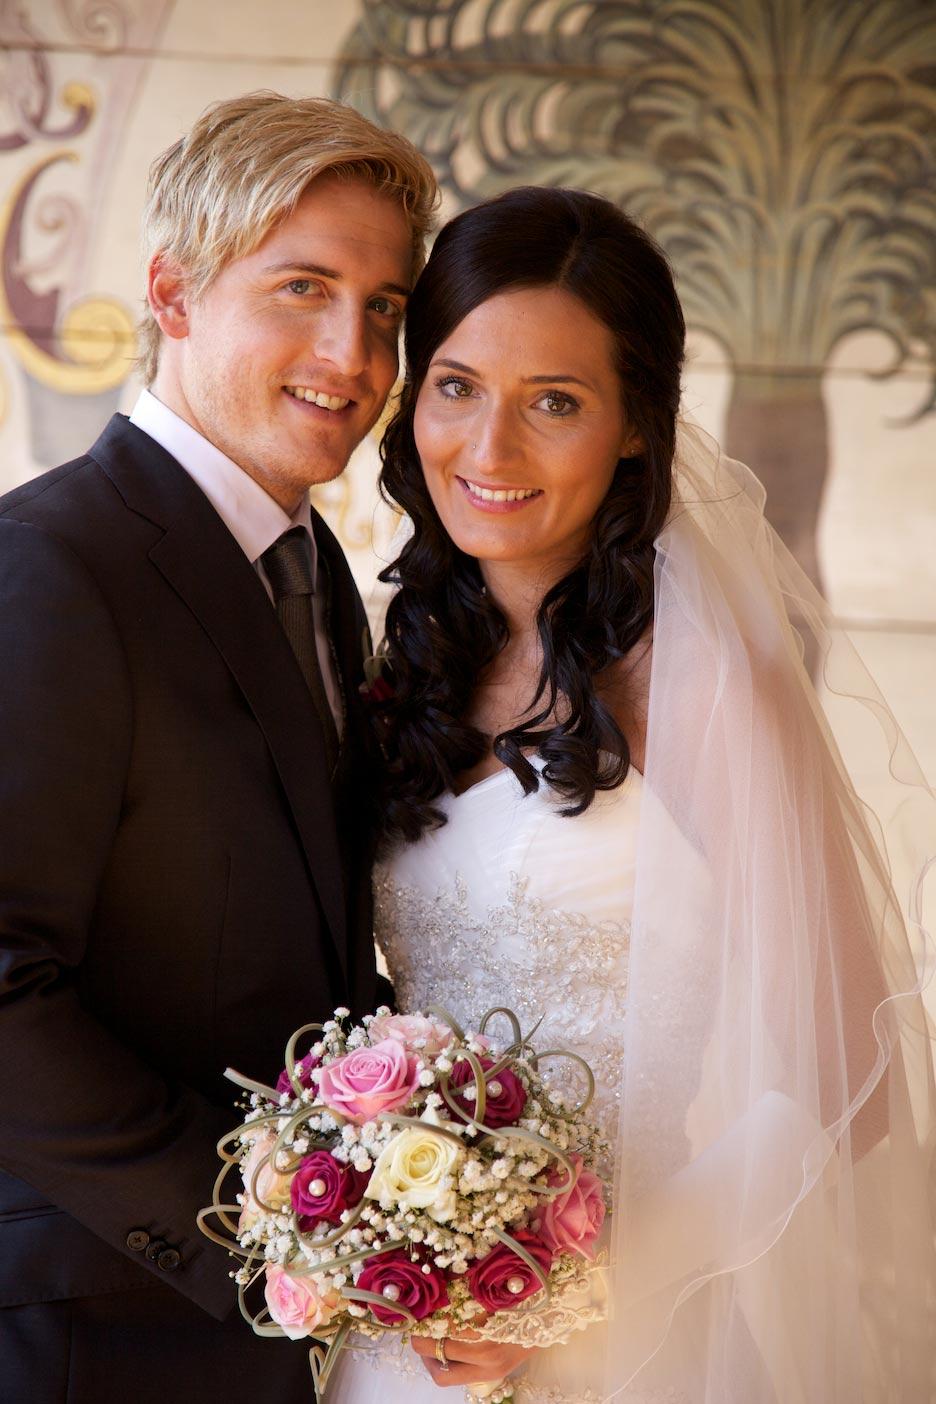 paarshooting in darmstadt - Hochzeitshomepage Beispiele